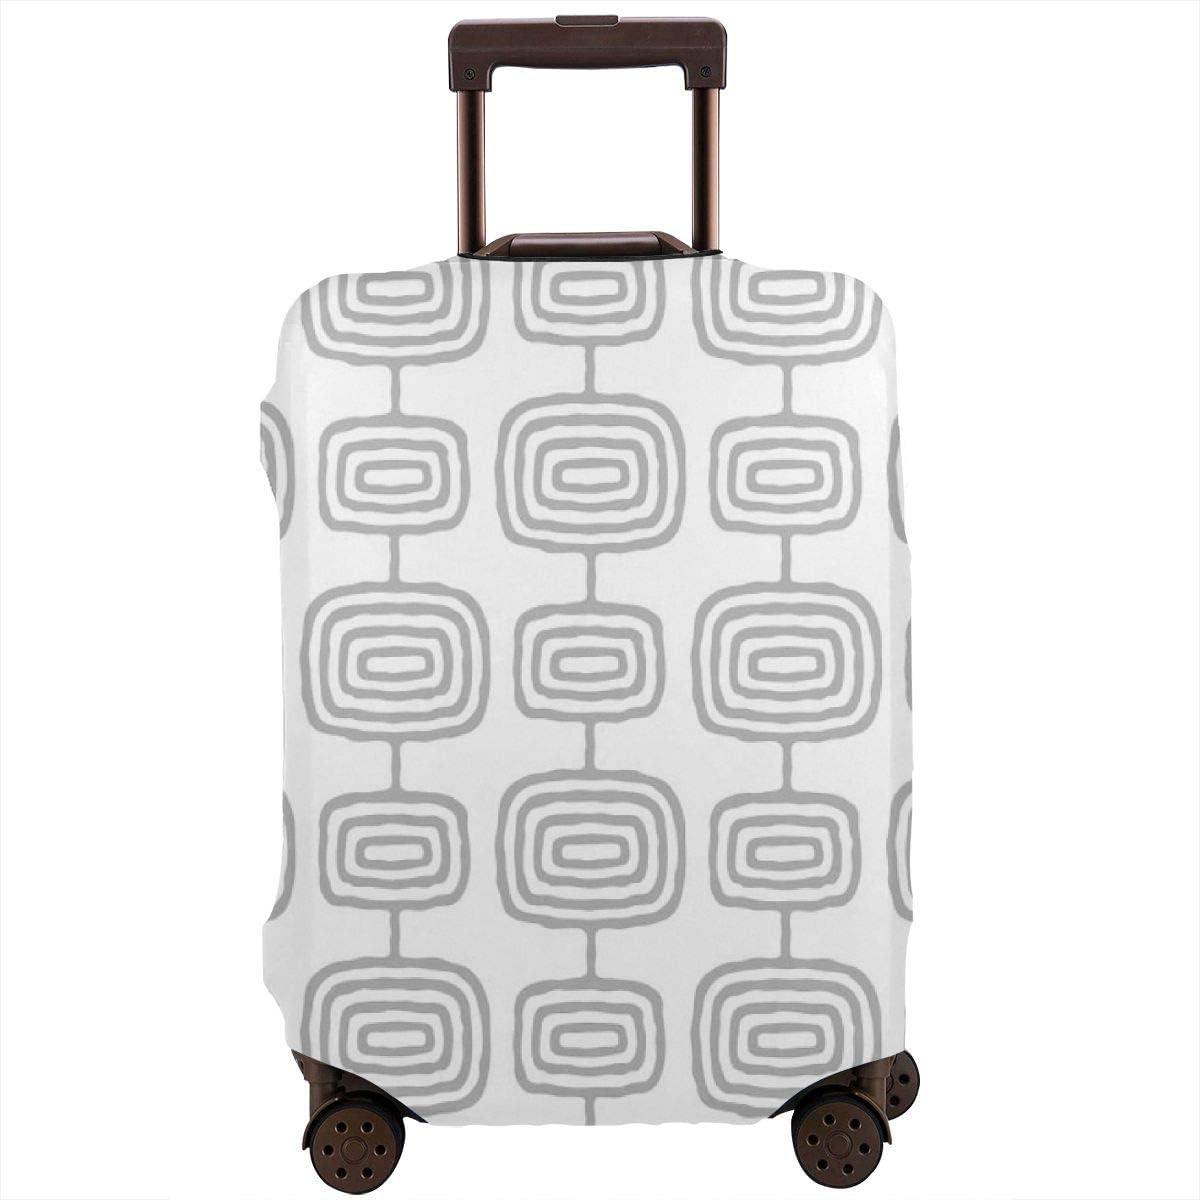 Mid Century - Funda para maleta de viaje con diseño moderno de anillas atómicas grises para maleta de 26 a 28 pulgadas